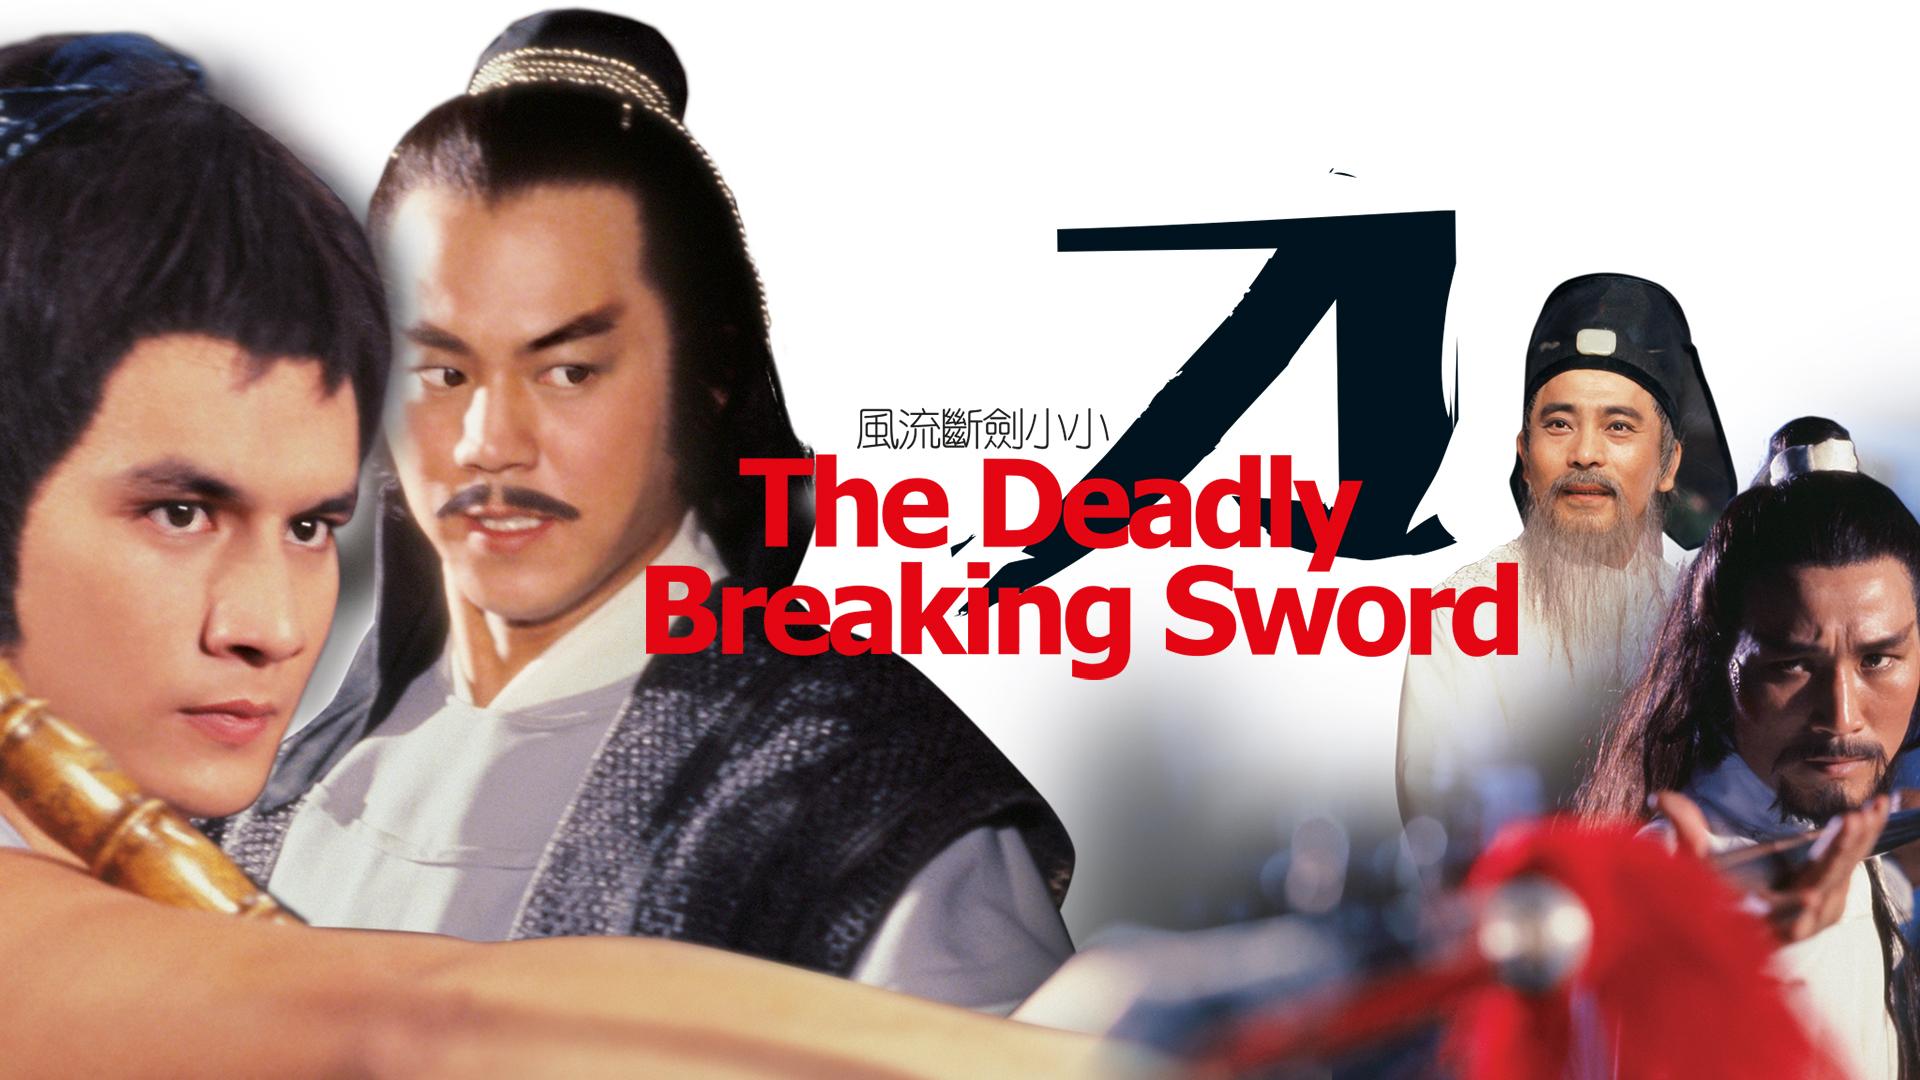 The Deadly Breaking Sword